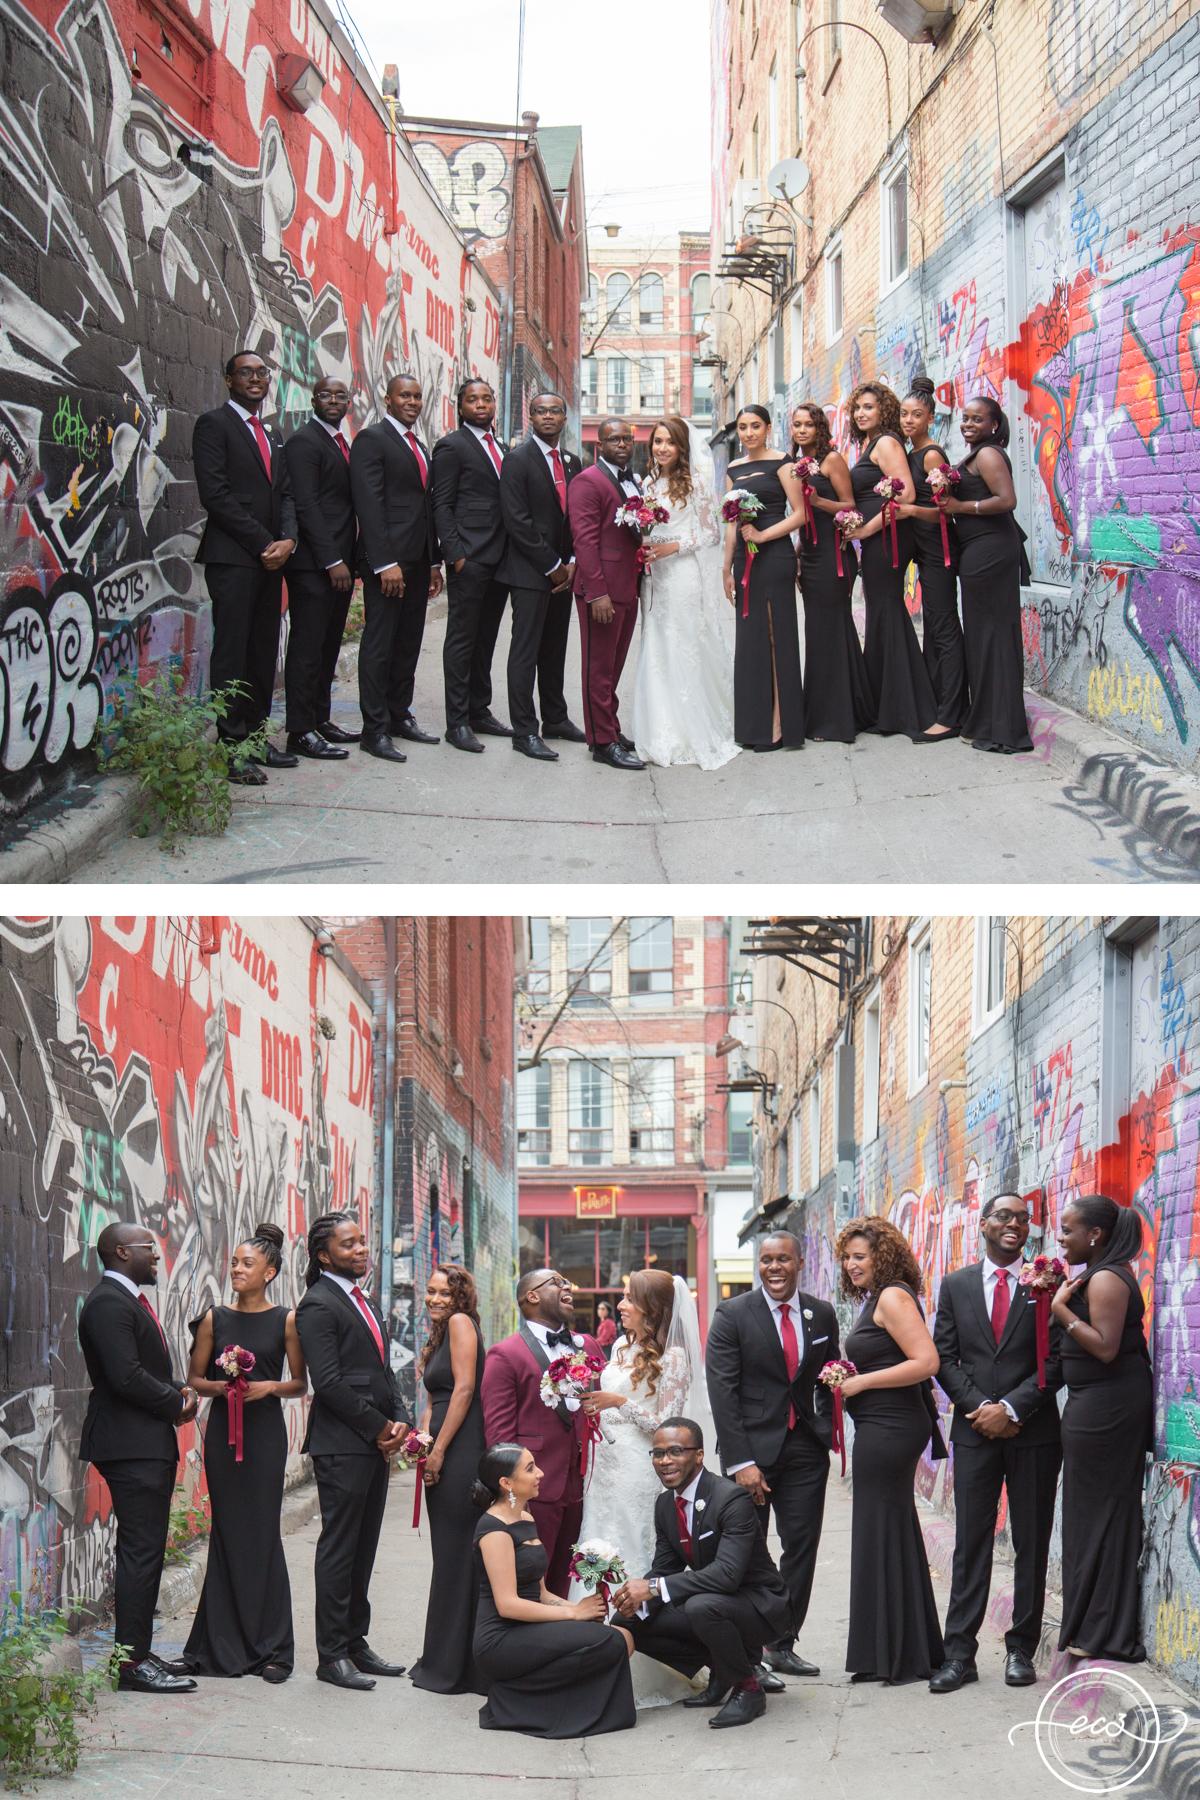 AA-Rustic-Toronto-Burroughes-Wedding32.jpg